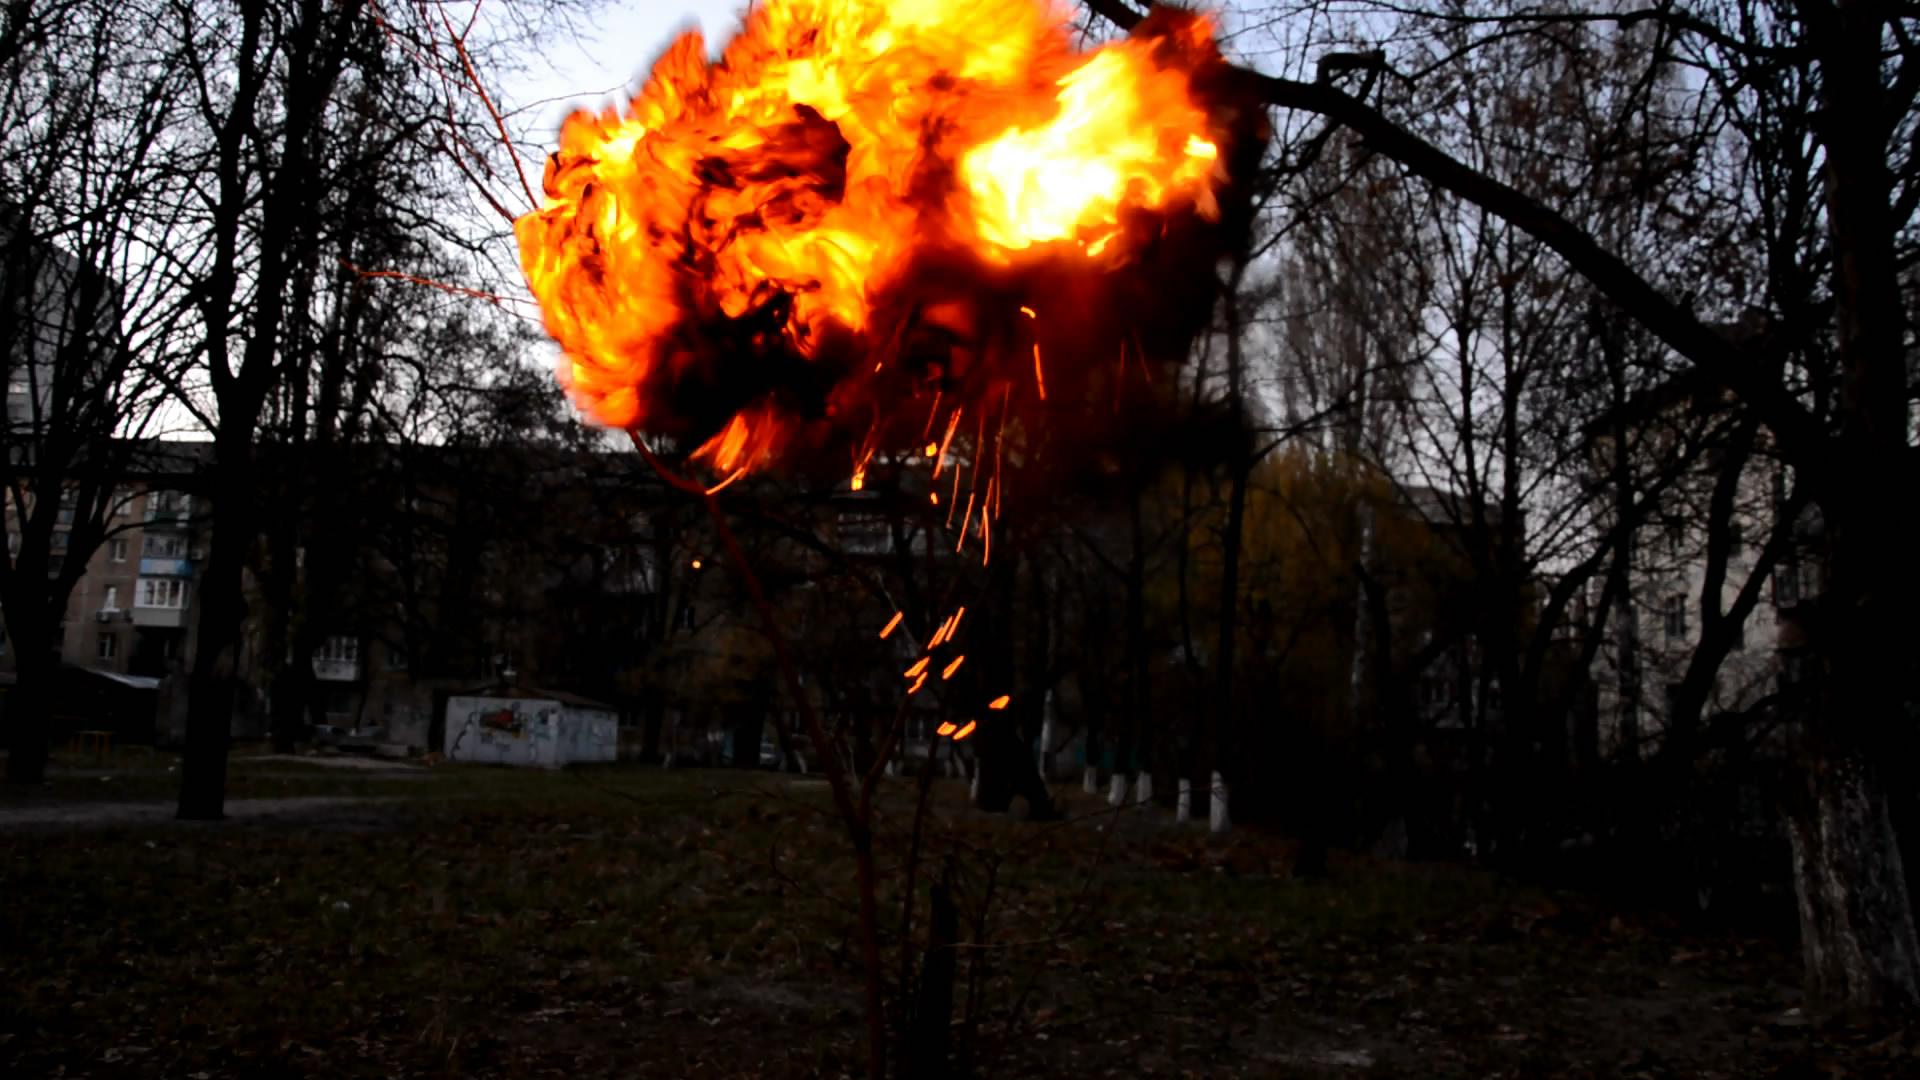 Ацетилен (взрыв воздушного шарика). Acetylene (Explosion of Toy Balloon)